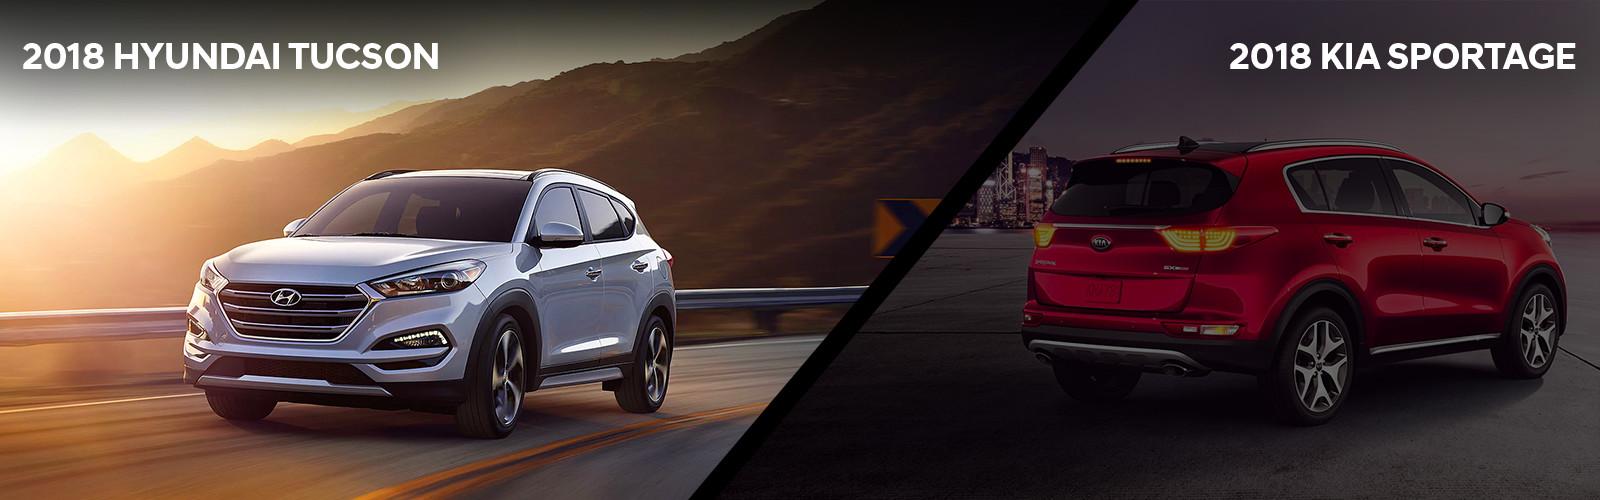 2018 Hyundai Tucson Se V 2018 Kia Sportage Lx